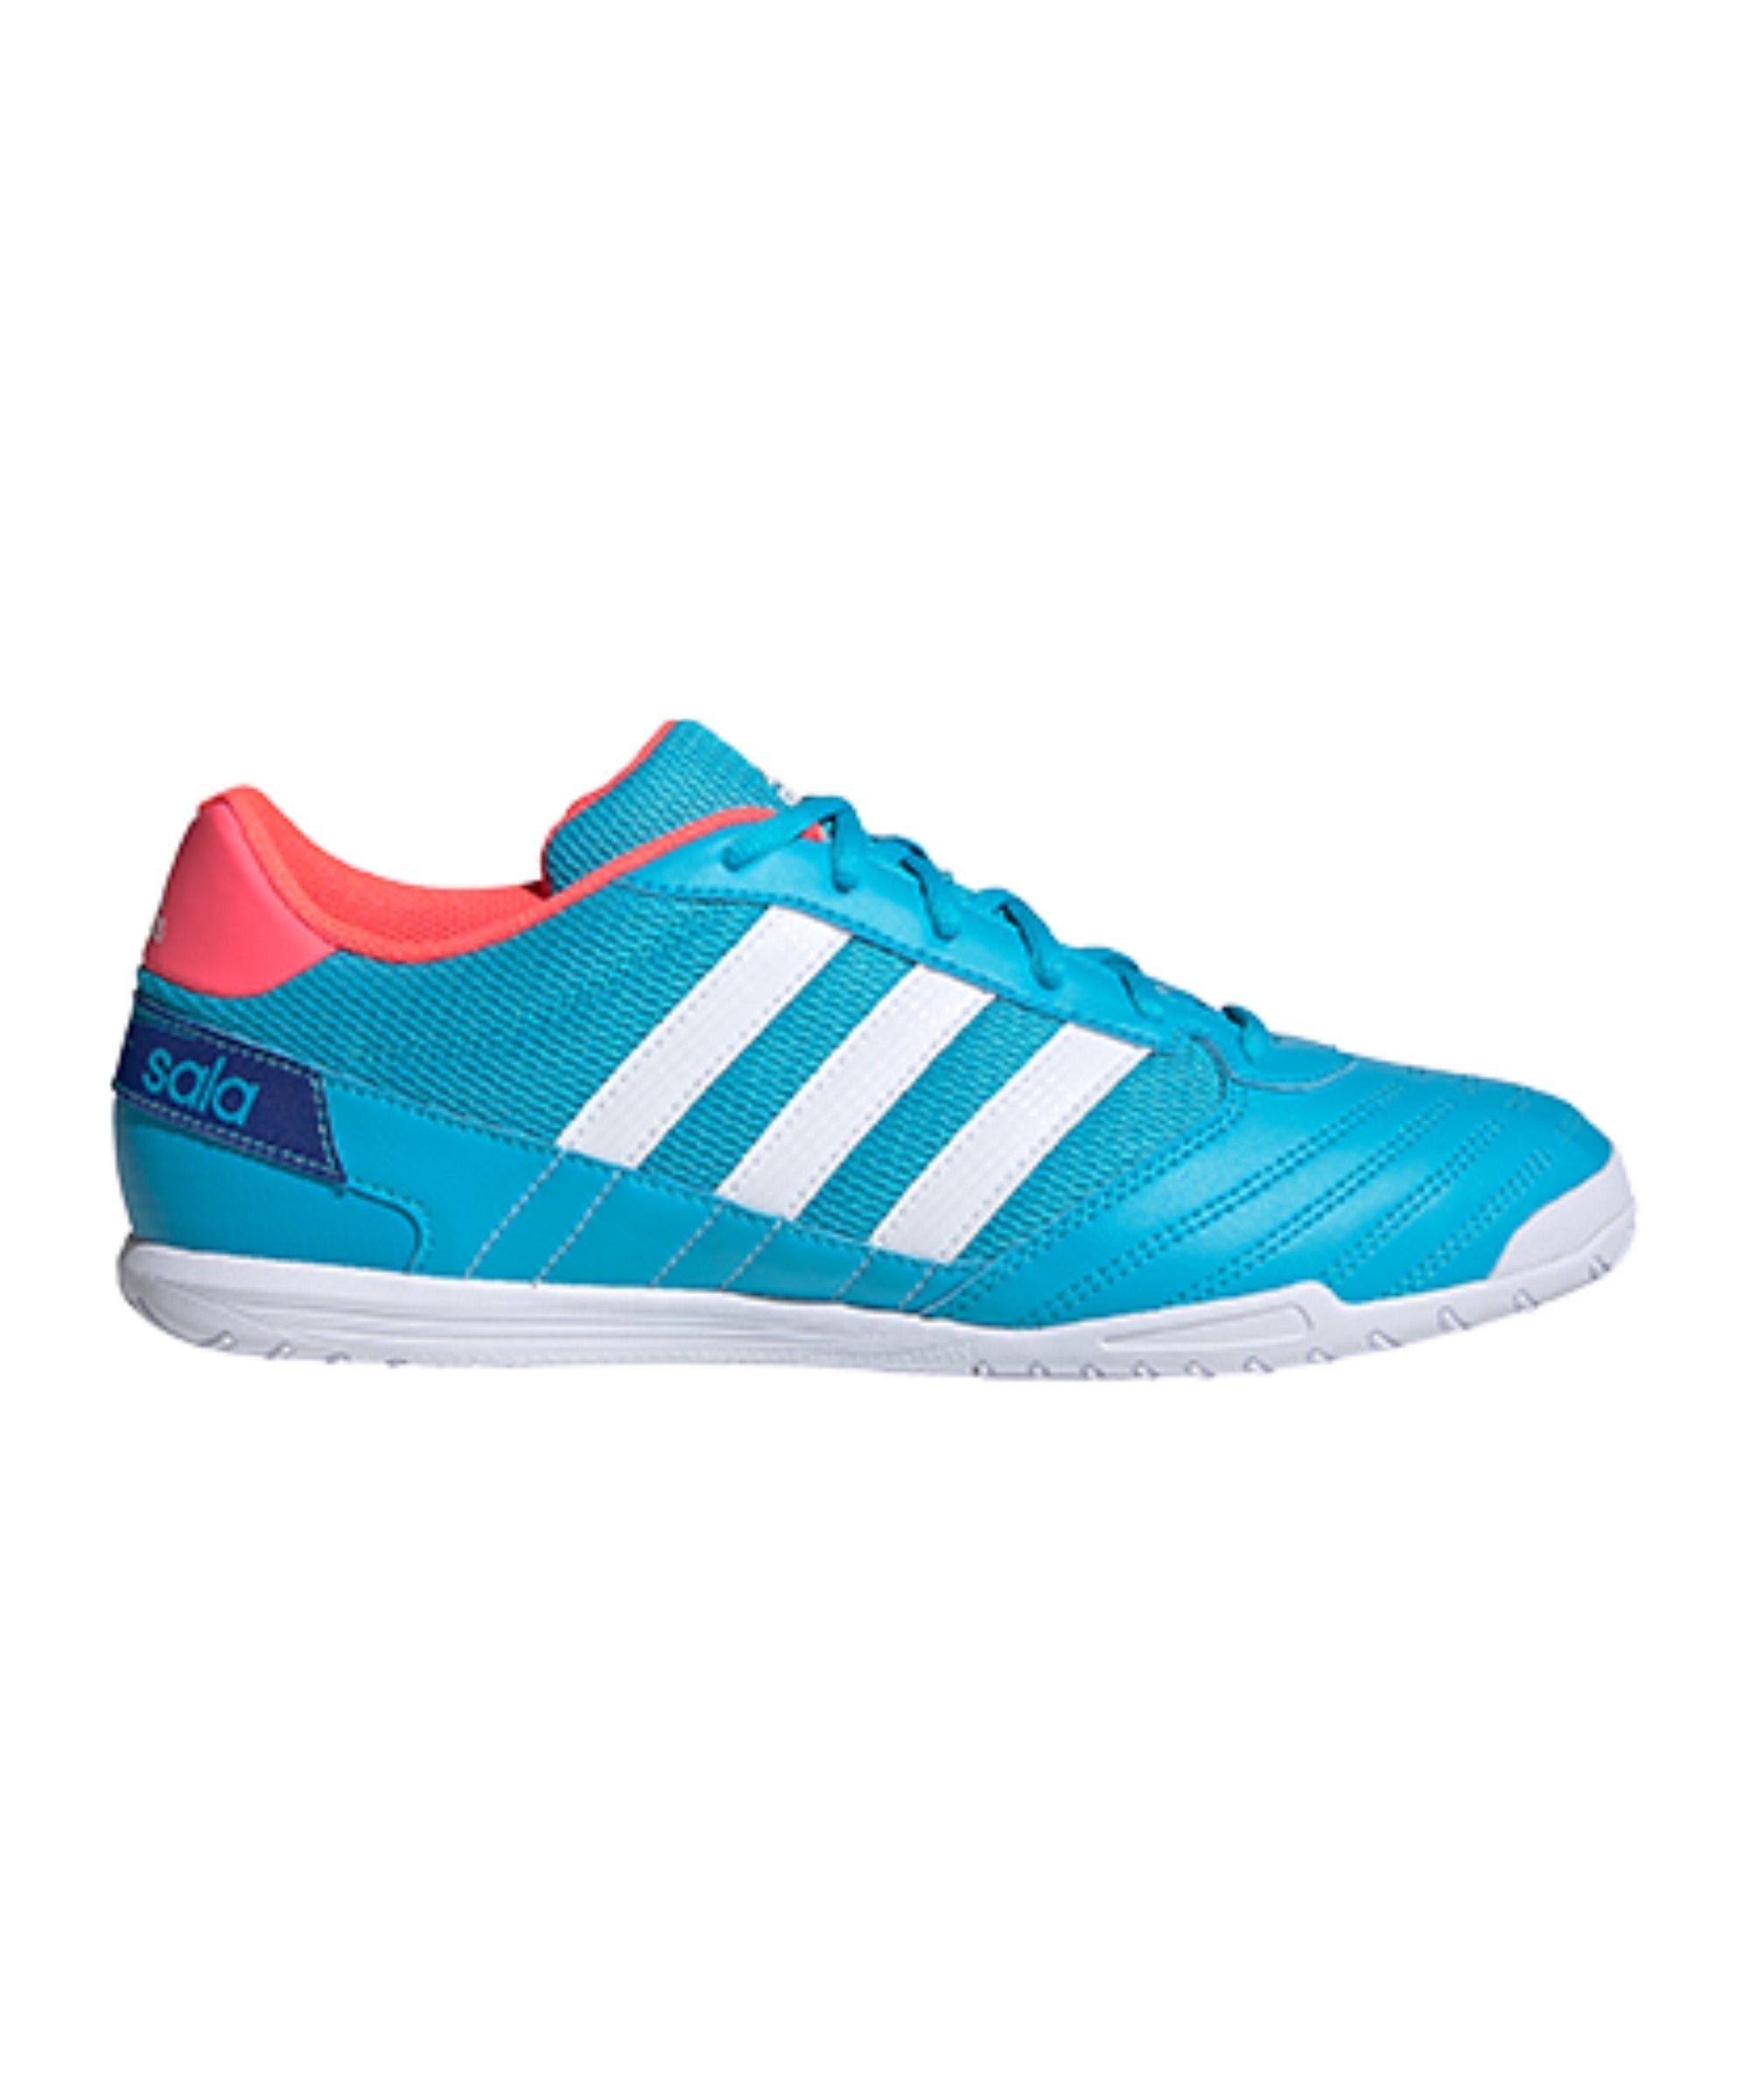 adidas Super Sala IN Halle Blau Pink Weiss - blau